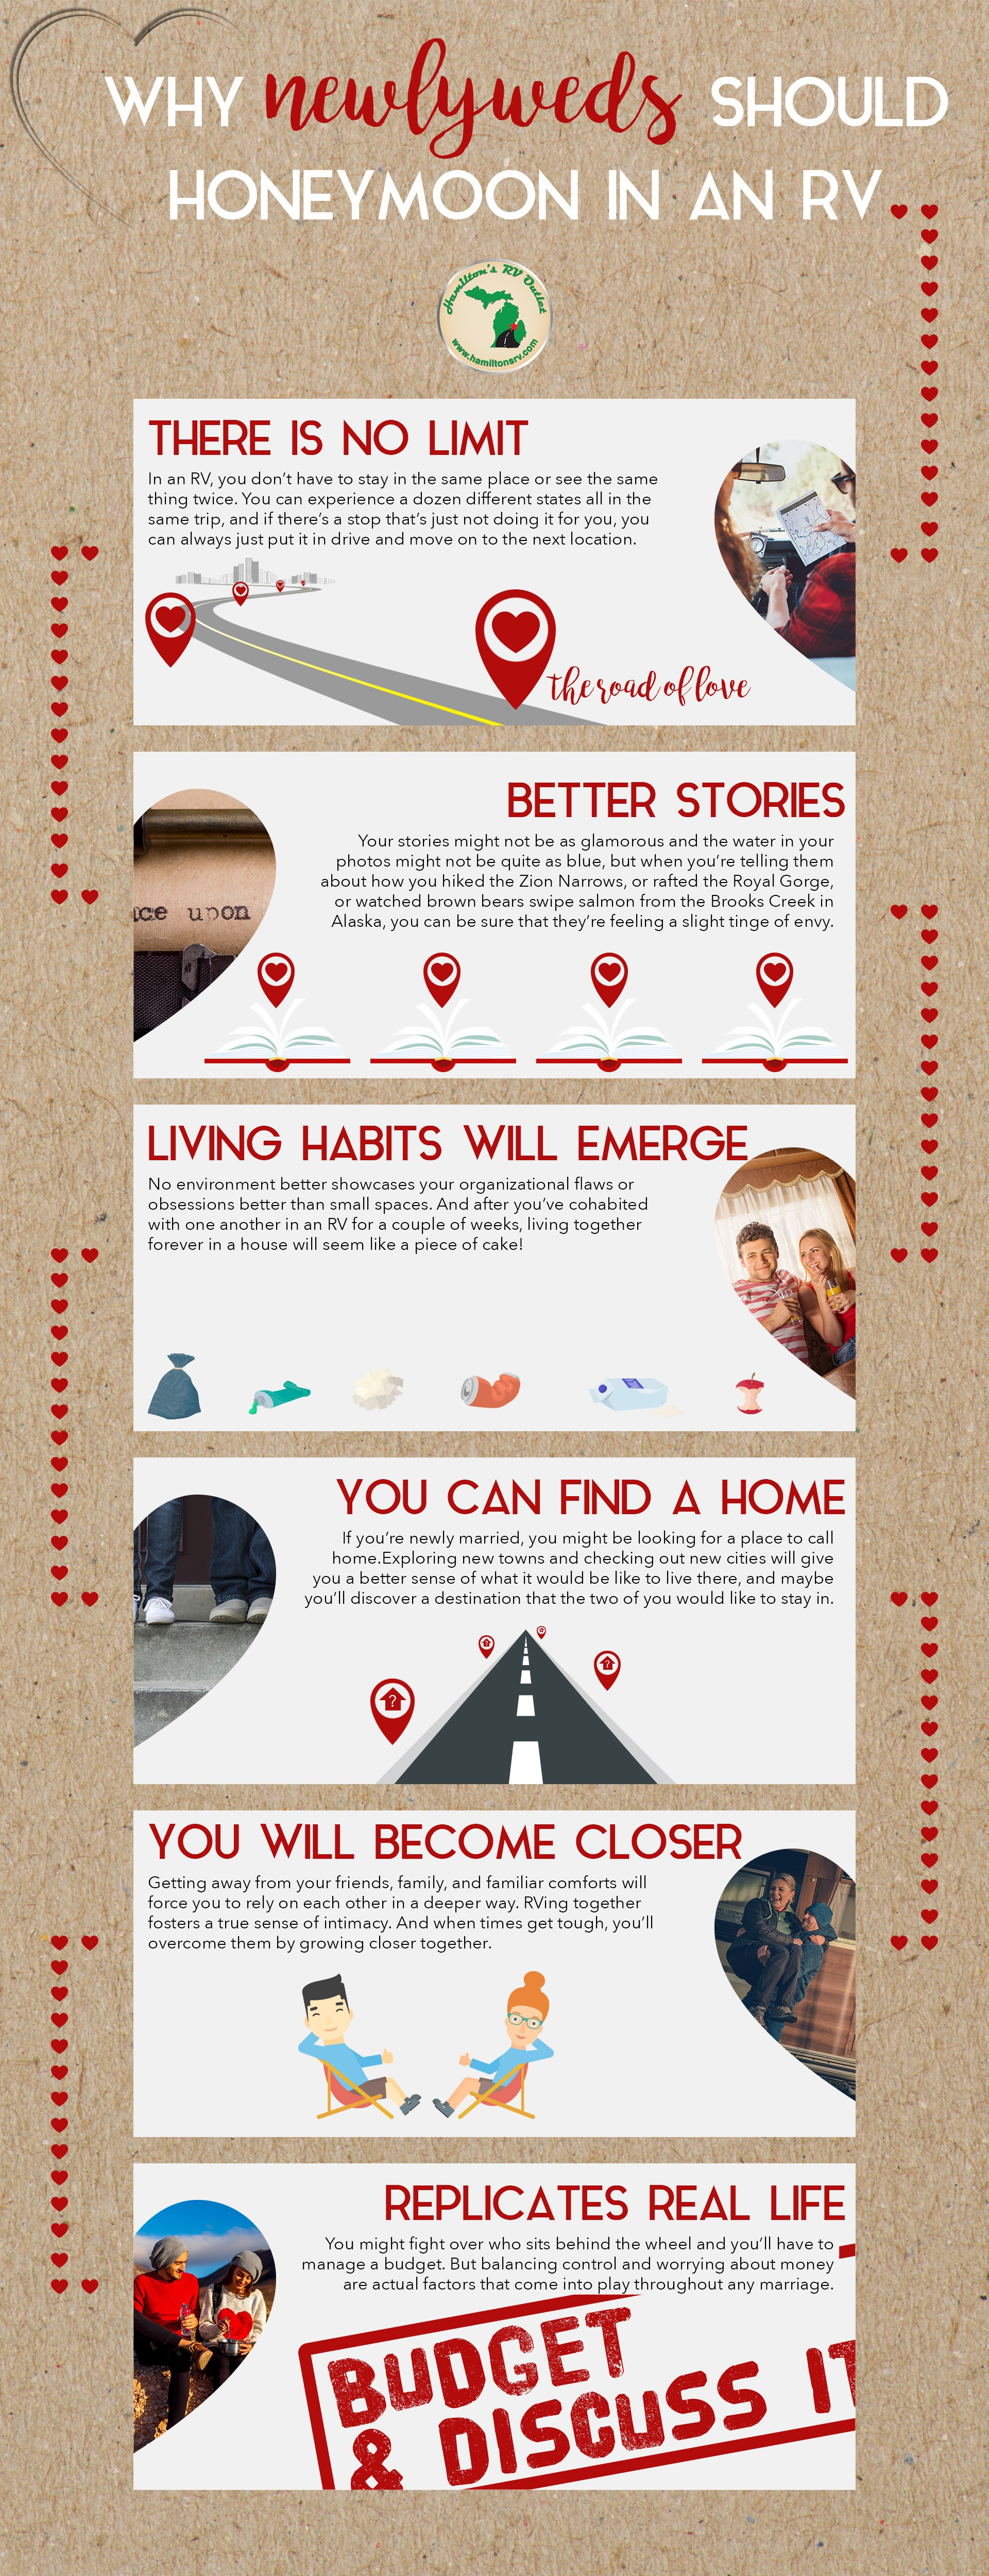 newlyweds honeymoon infographic